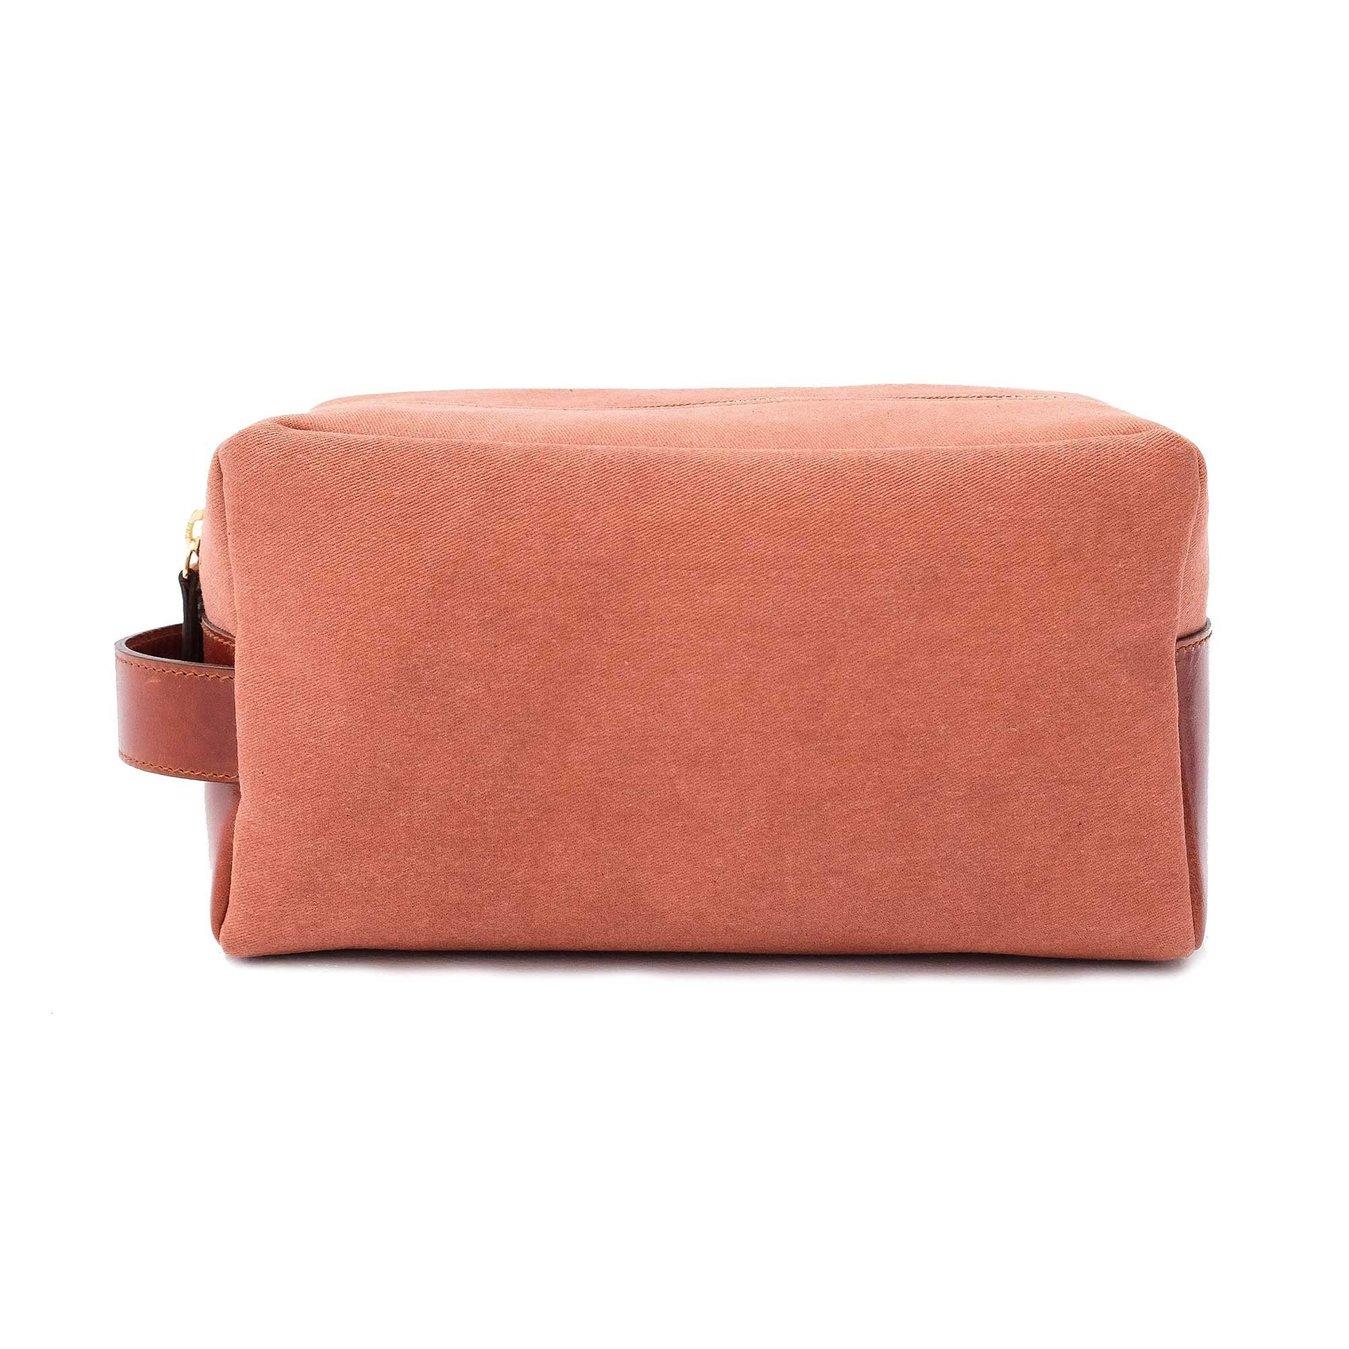 La Portegna - La Portegna Waterproof Canvas Leather Rusty Shaving Set Bag